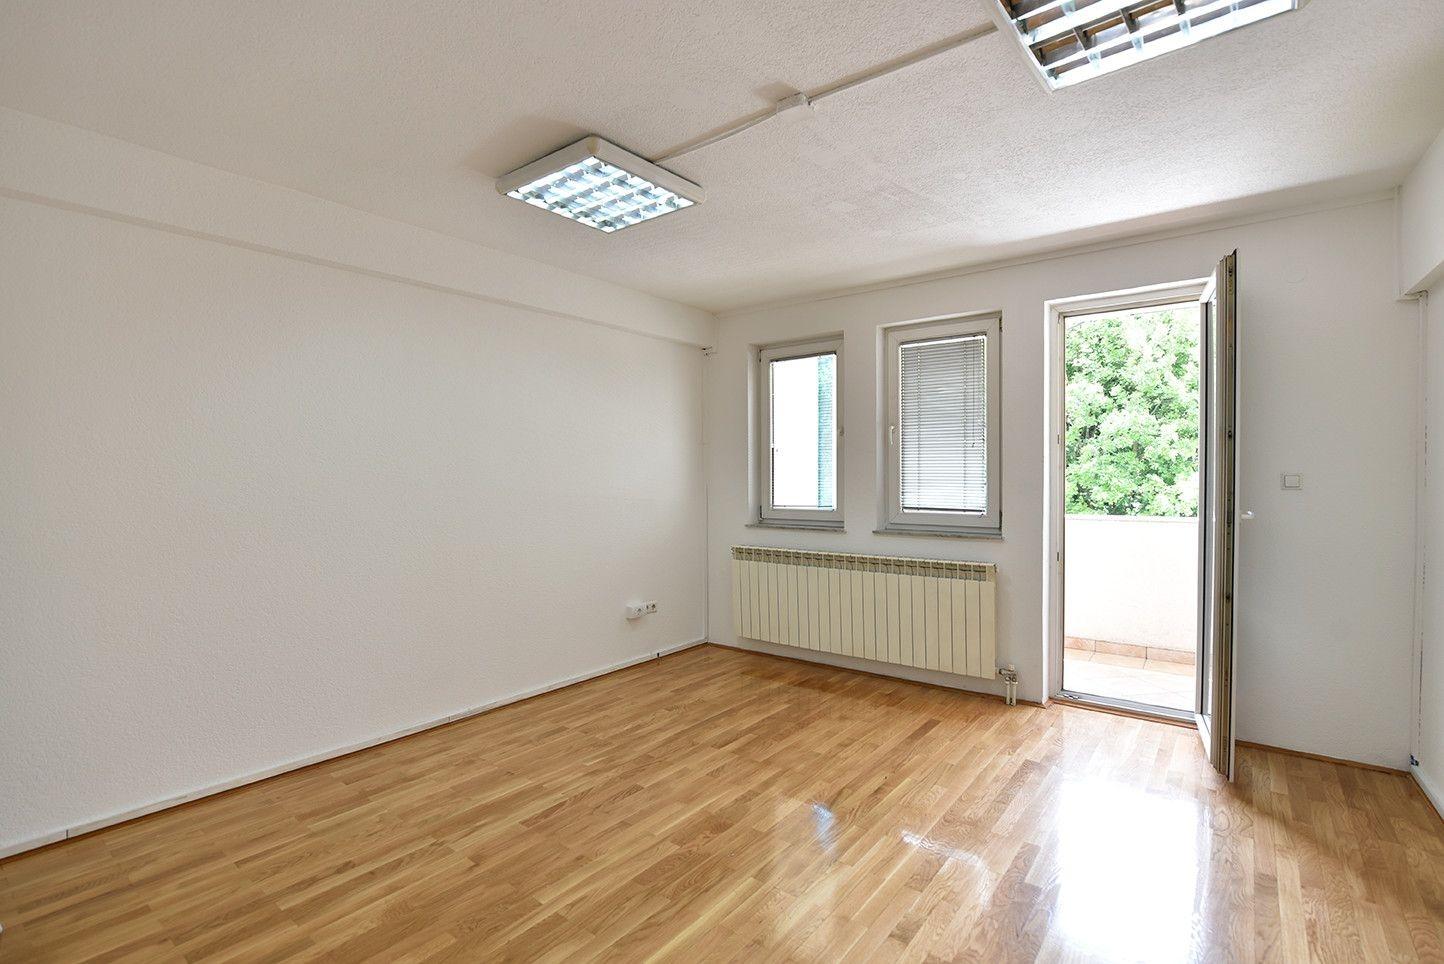 Poslovni prostor/ Grbavica/ 100 m2